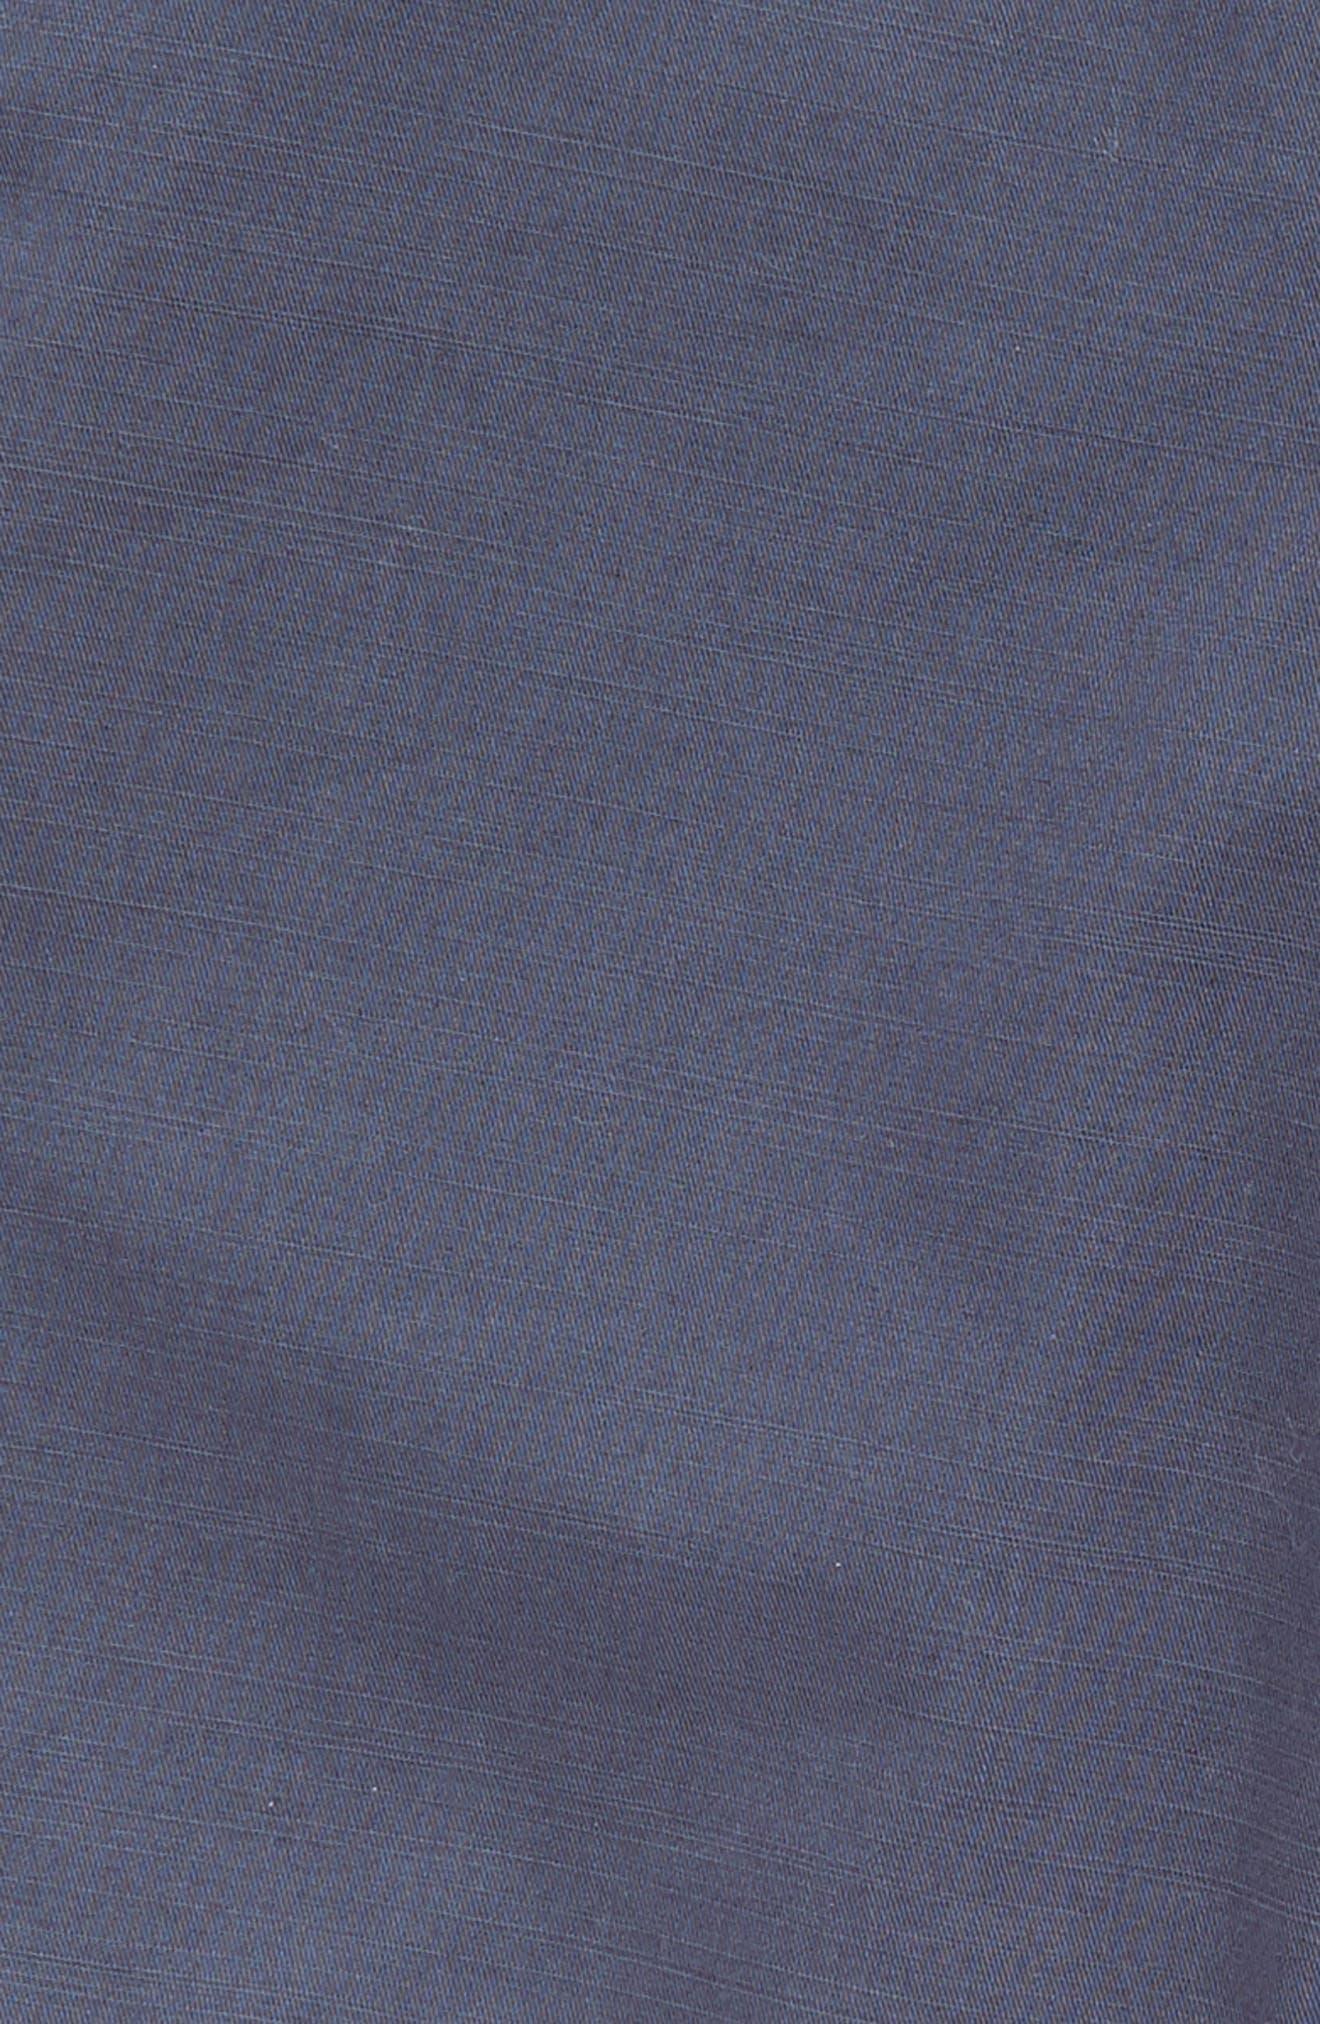 Jay Chino Shorts,                             Alternate thumbnail 3, color,                             Slate